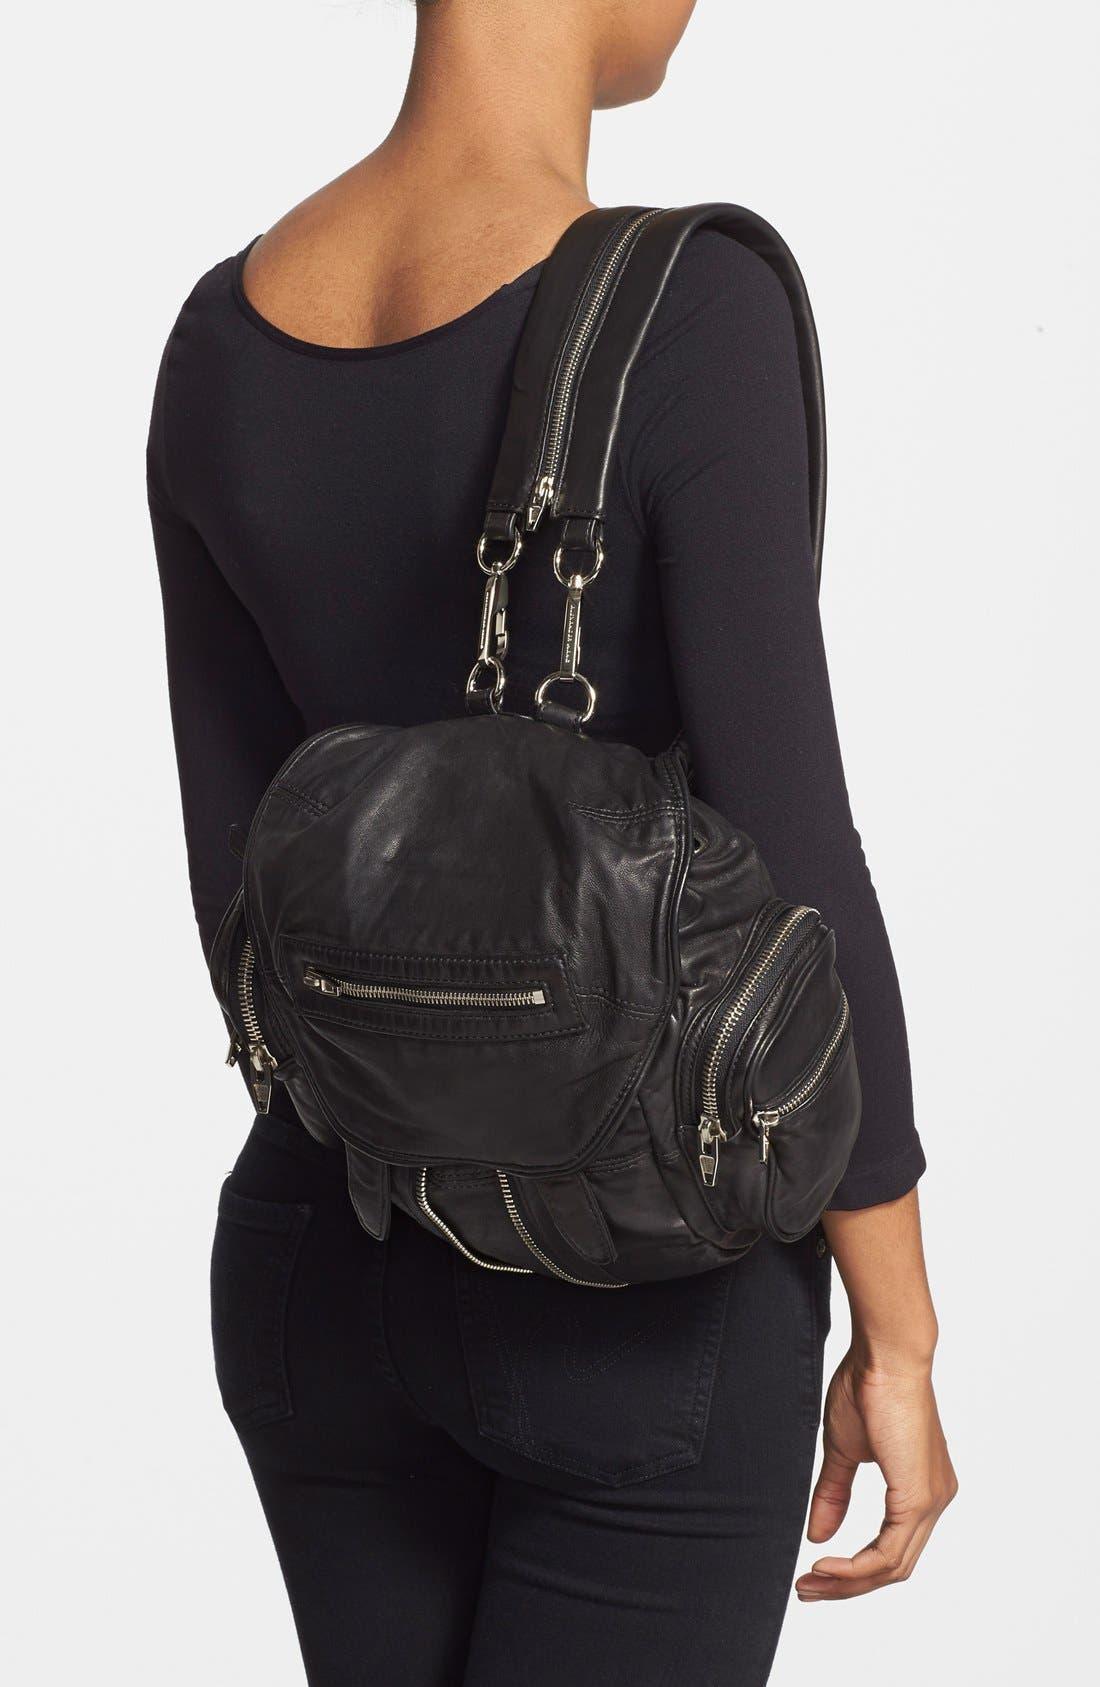 ALEXANDER WANG, 'Mini Marti' Leather Backpack, Alternate thumbnail 2, color, BLACK SLVR HRDR